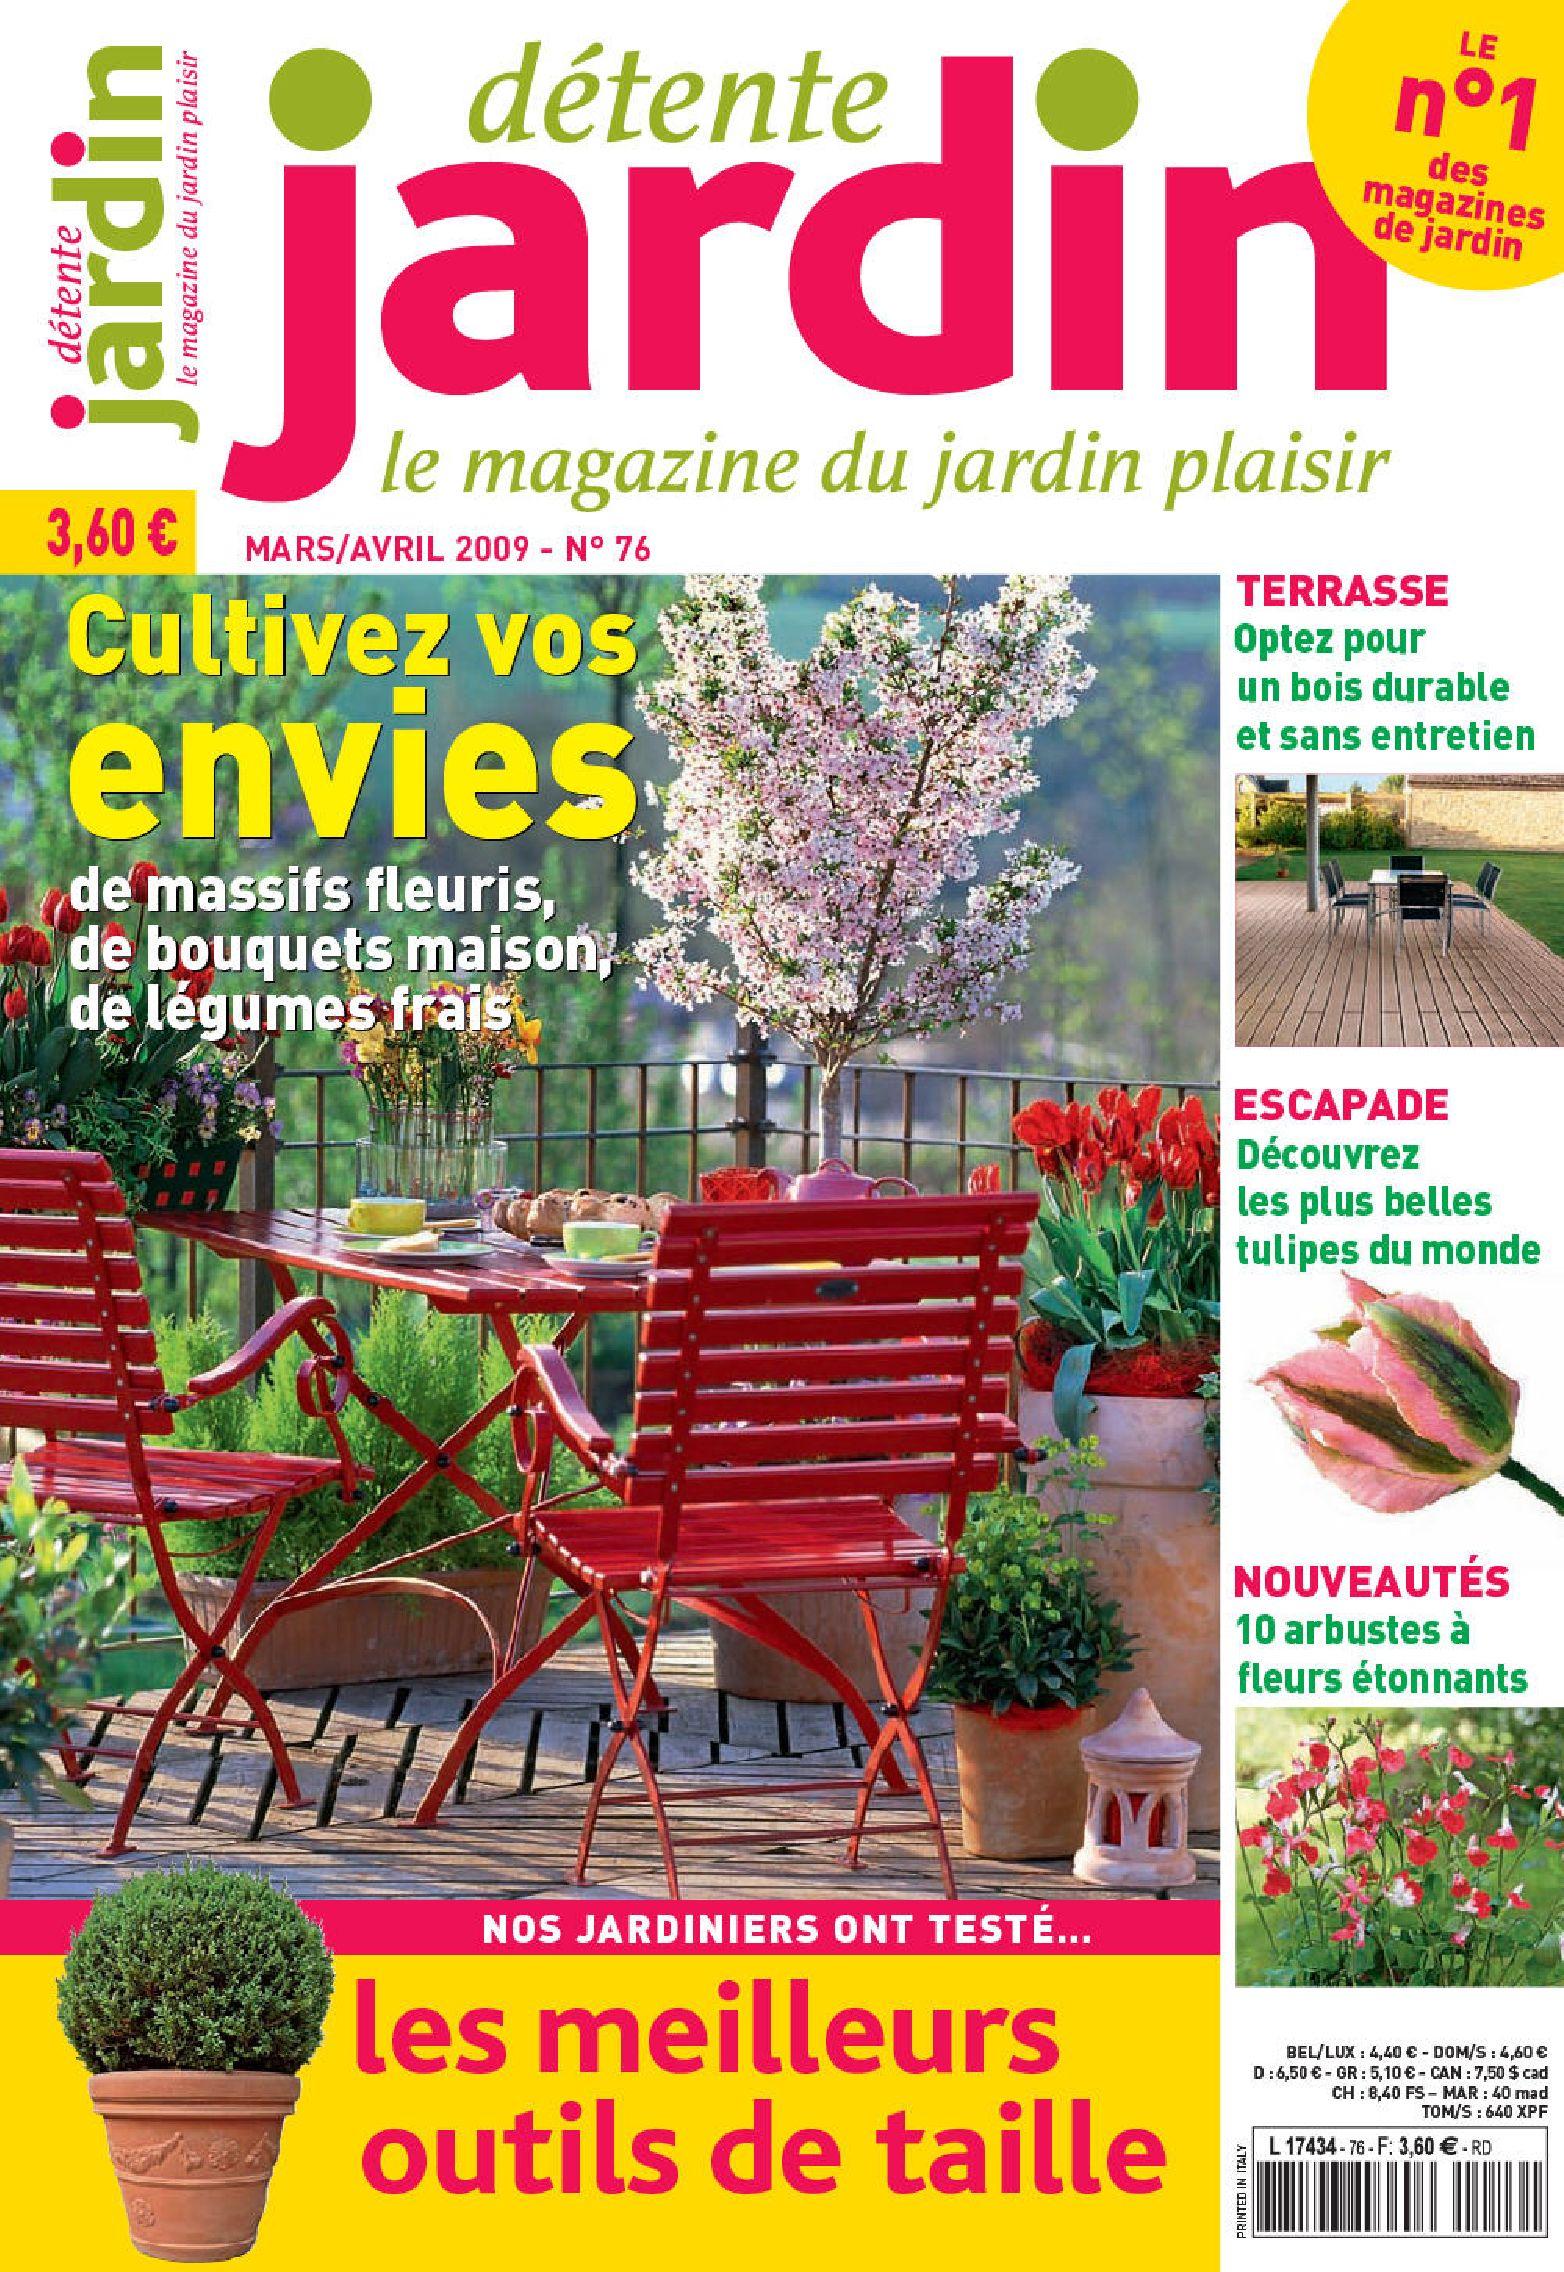 Detente.jardin.n73.french.mag-Eland By Ebooks Land - Issuu destiné Detente Jardin